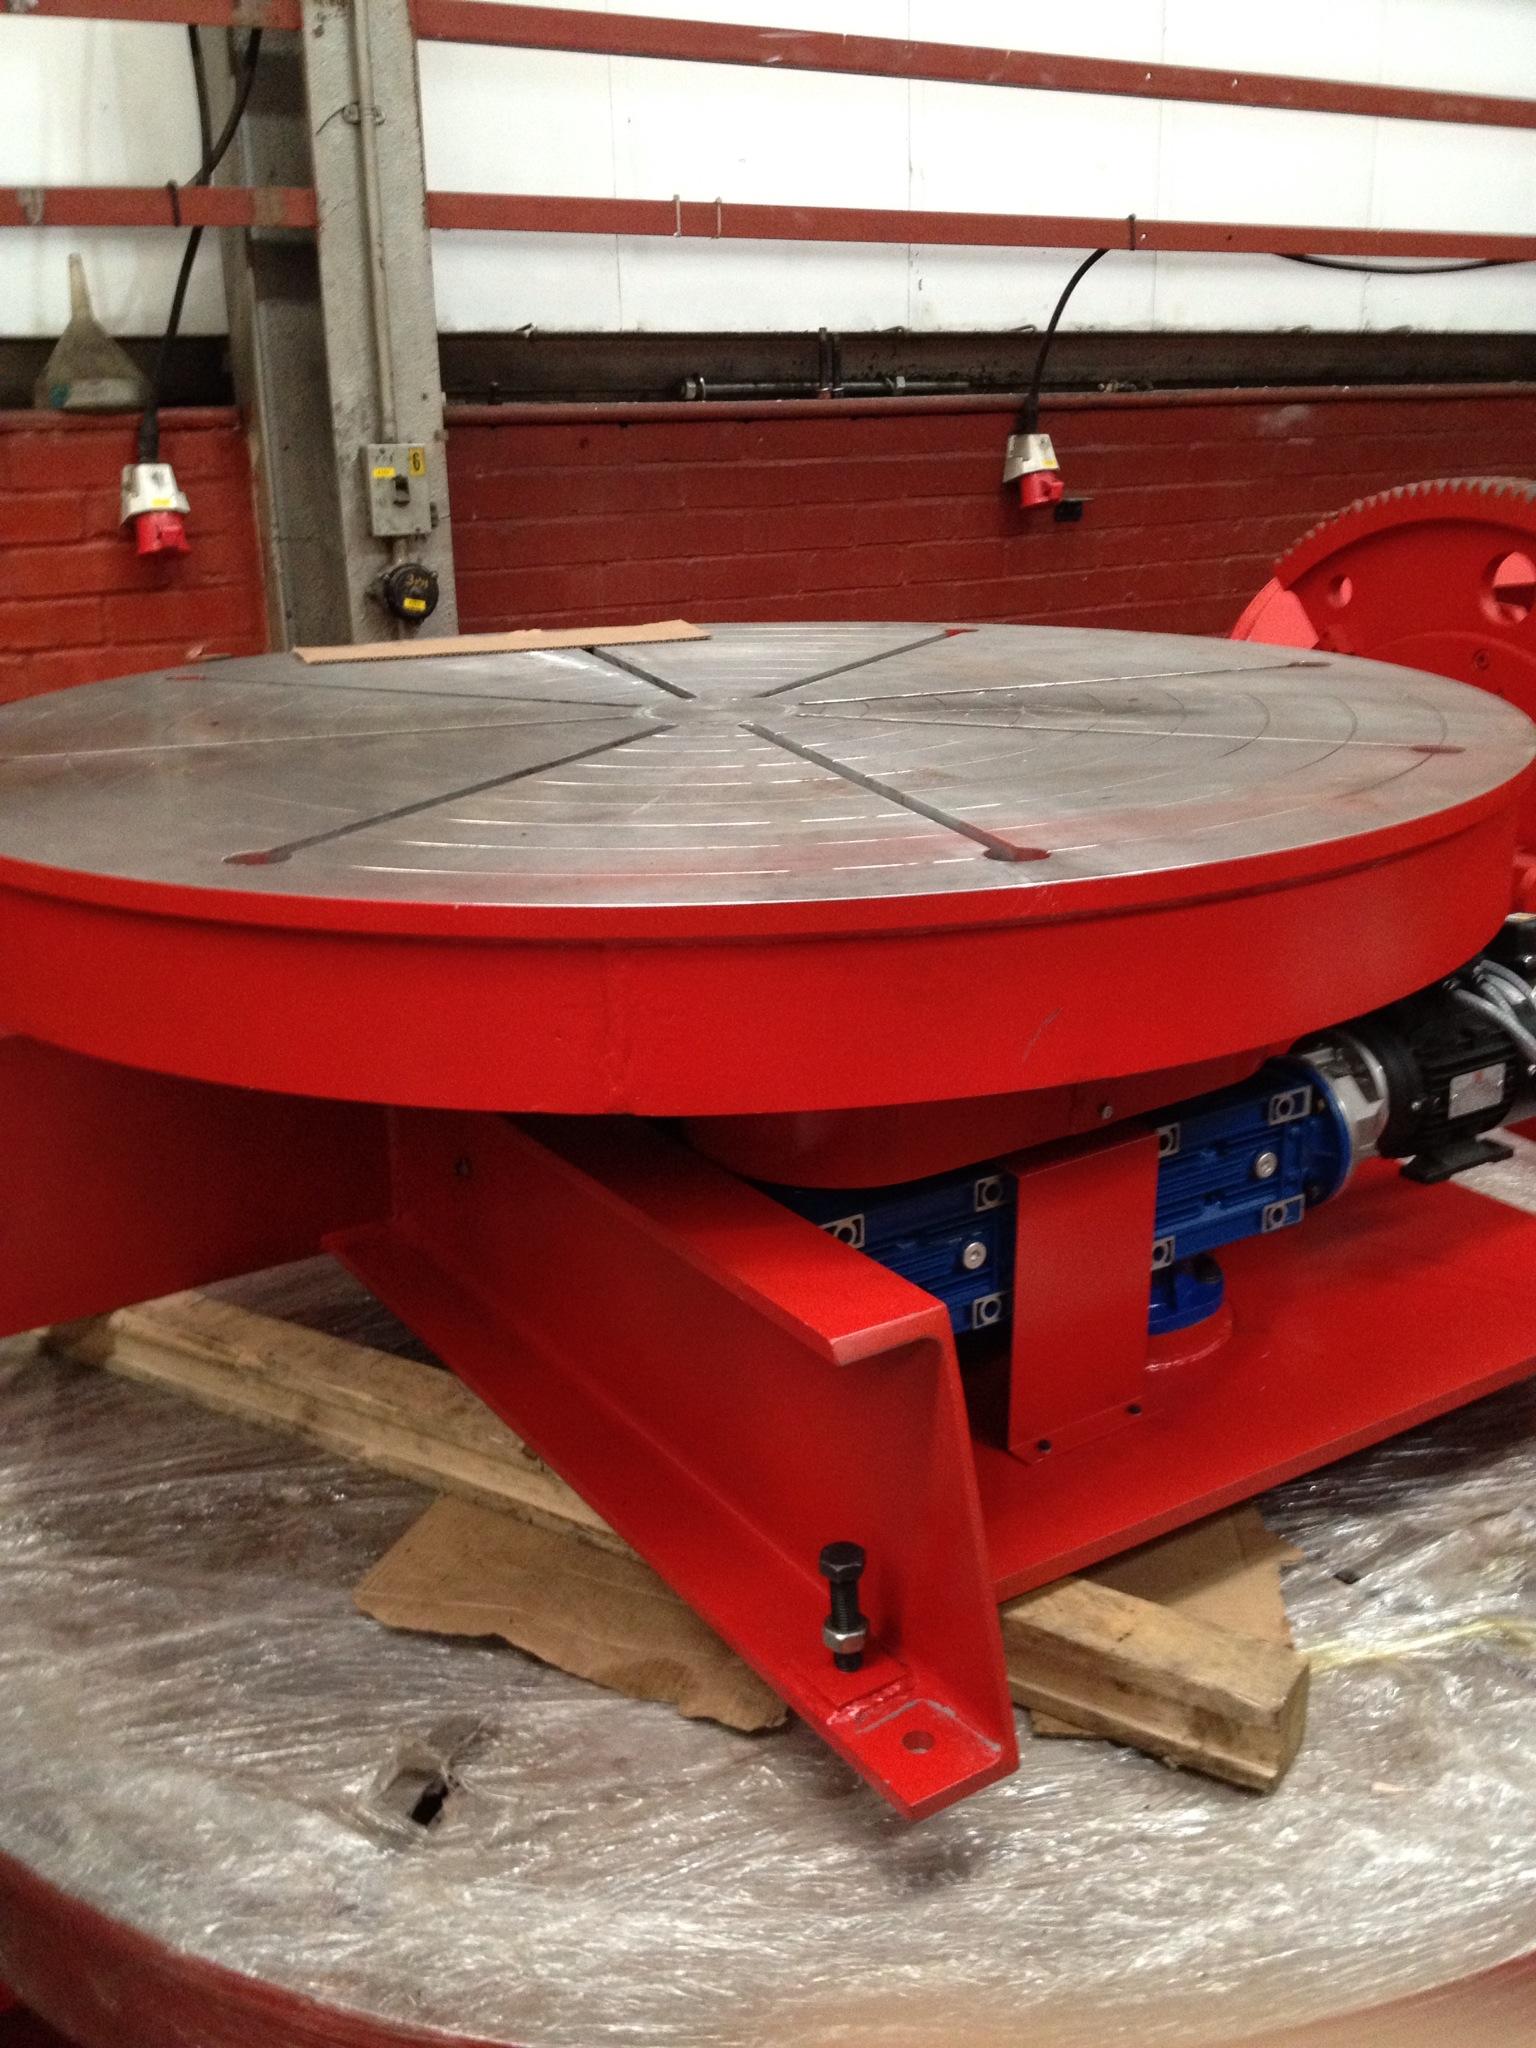 Used 5 Ton Welding Turntable Exapro